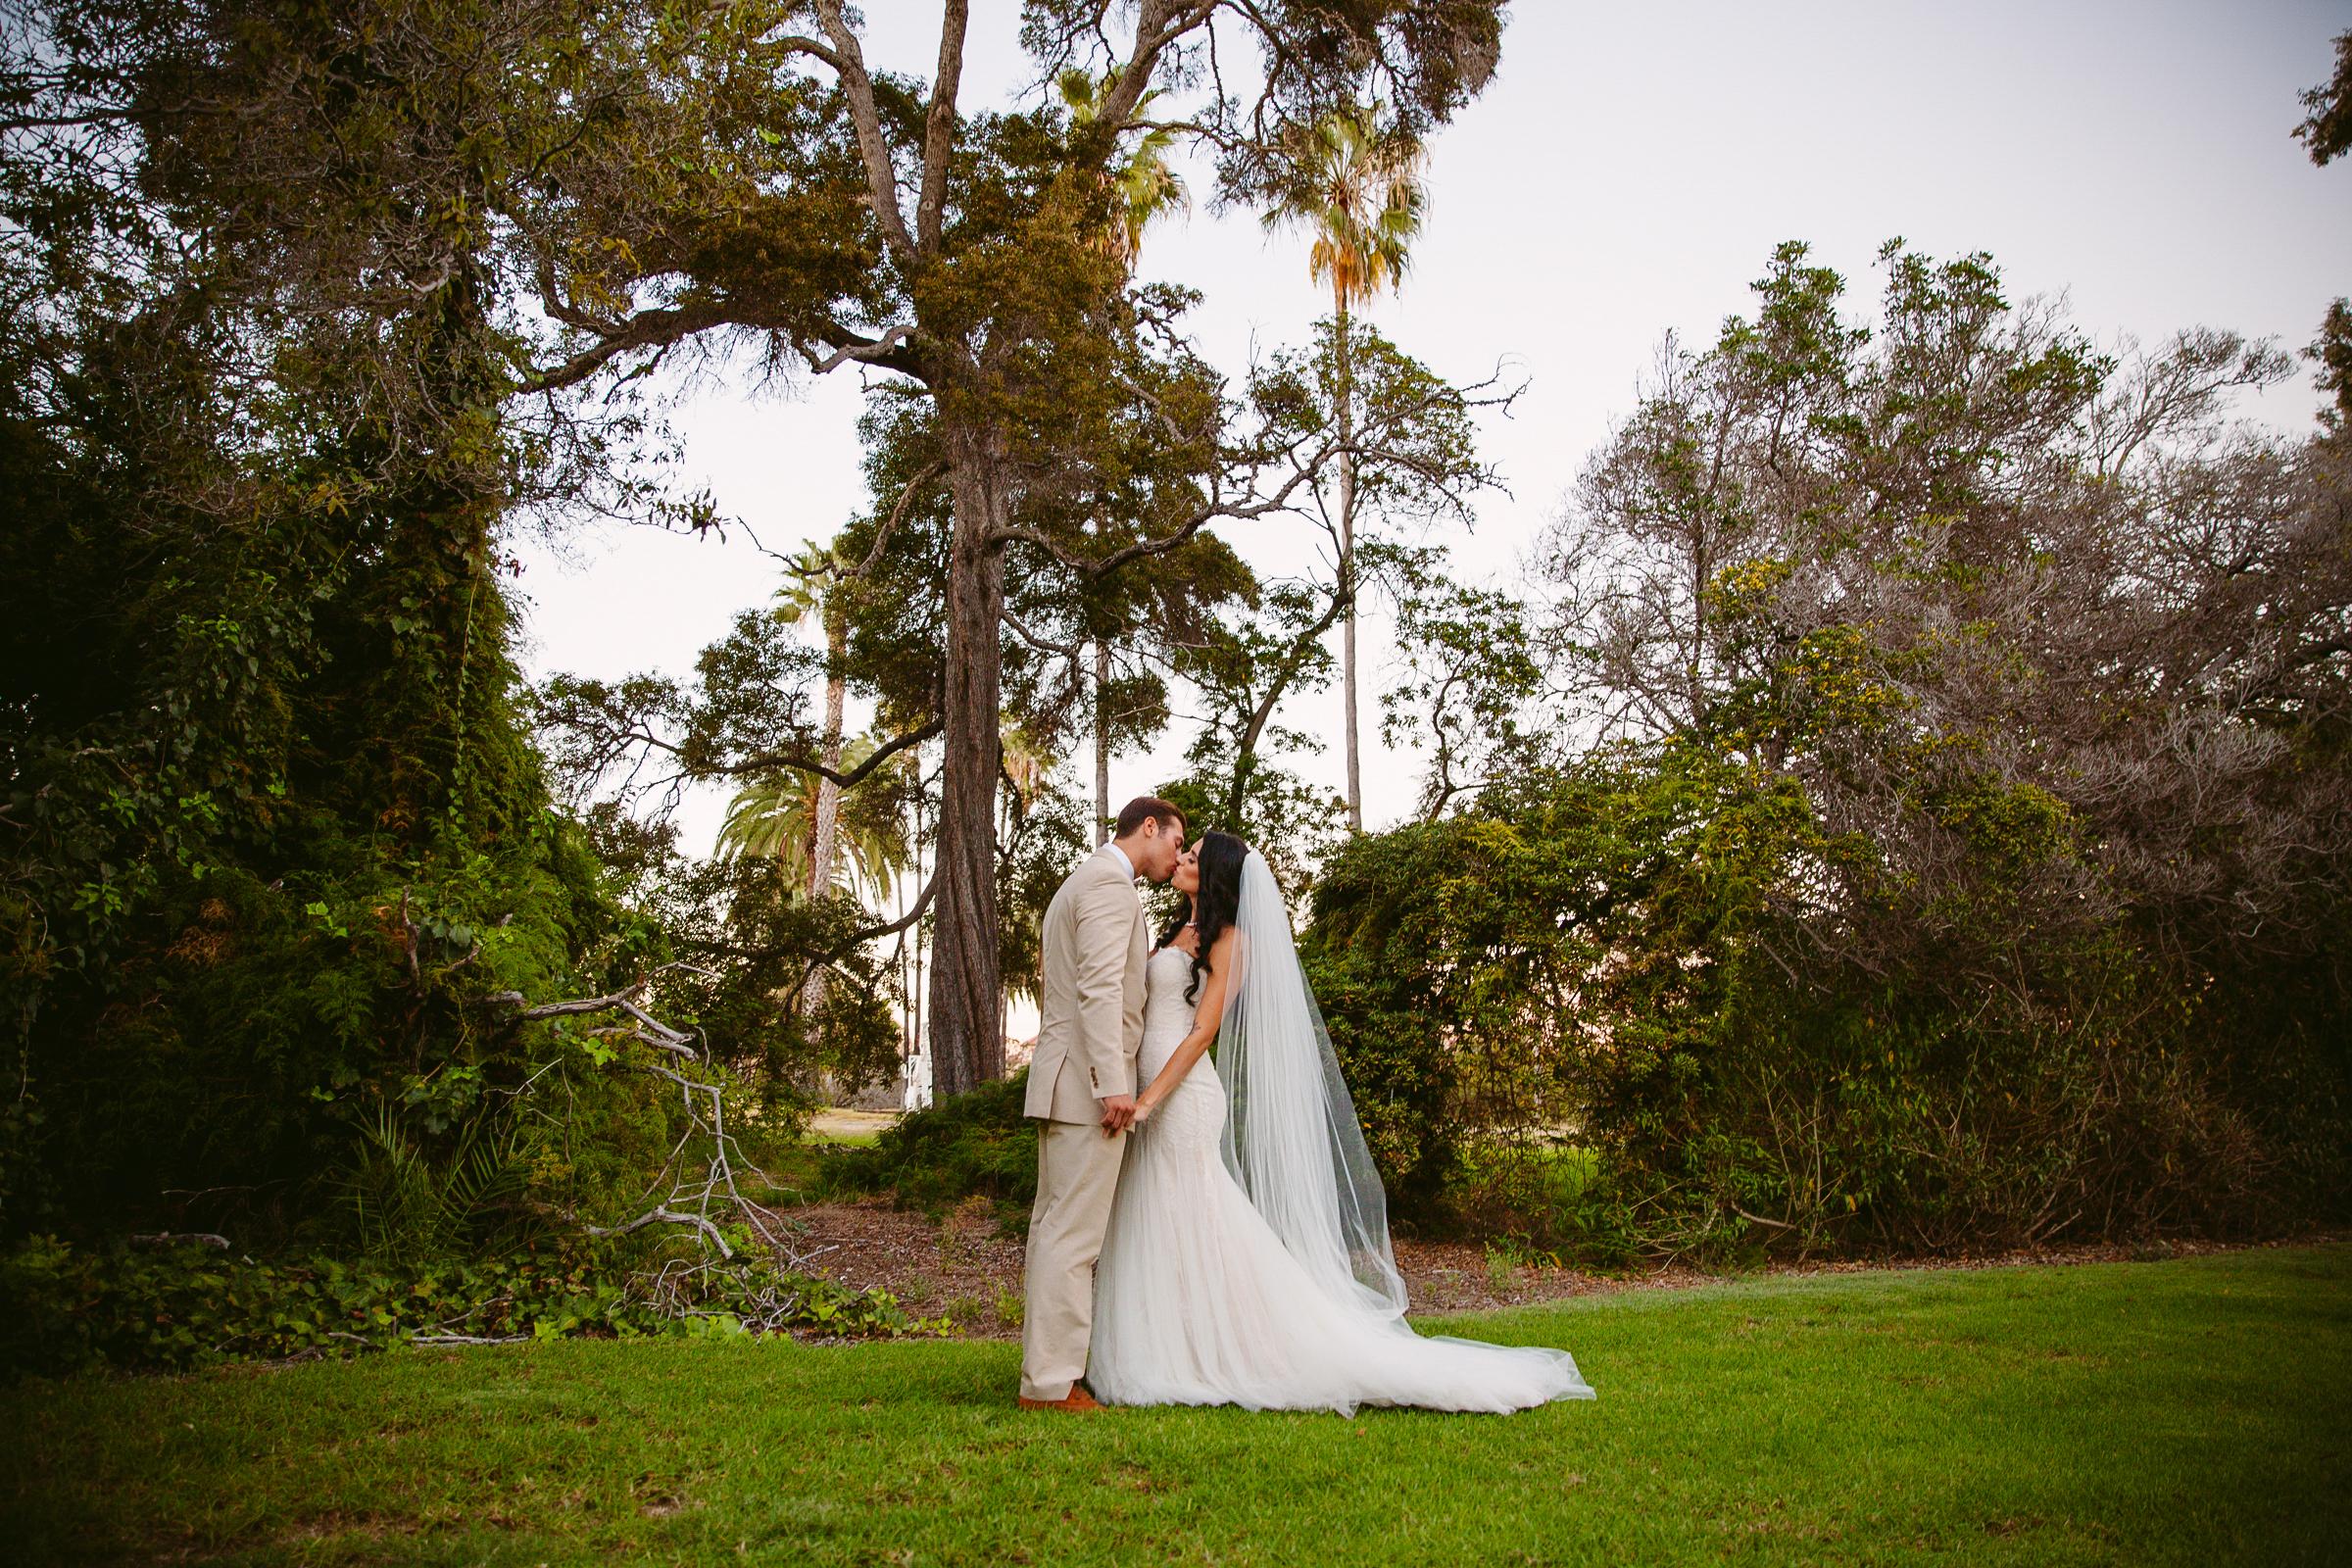 San Diego Wedding and Destination Wedding Photography Blessed Weddings 110.jpg